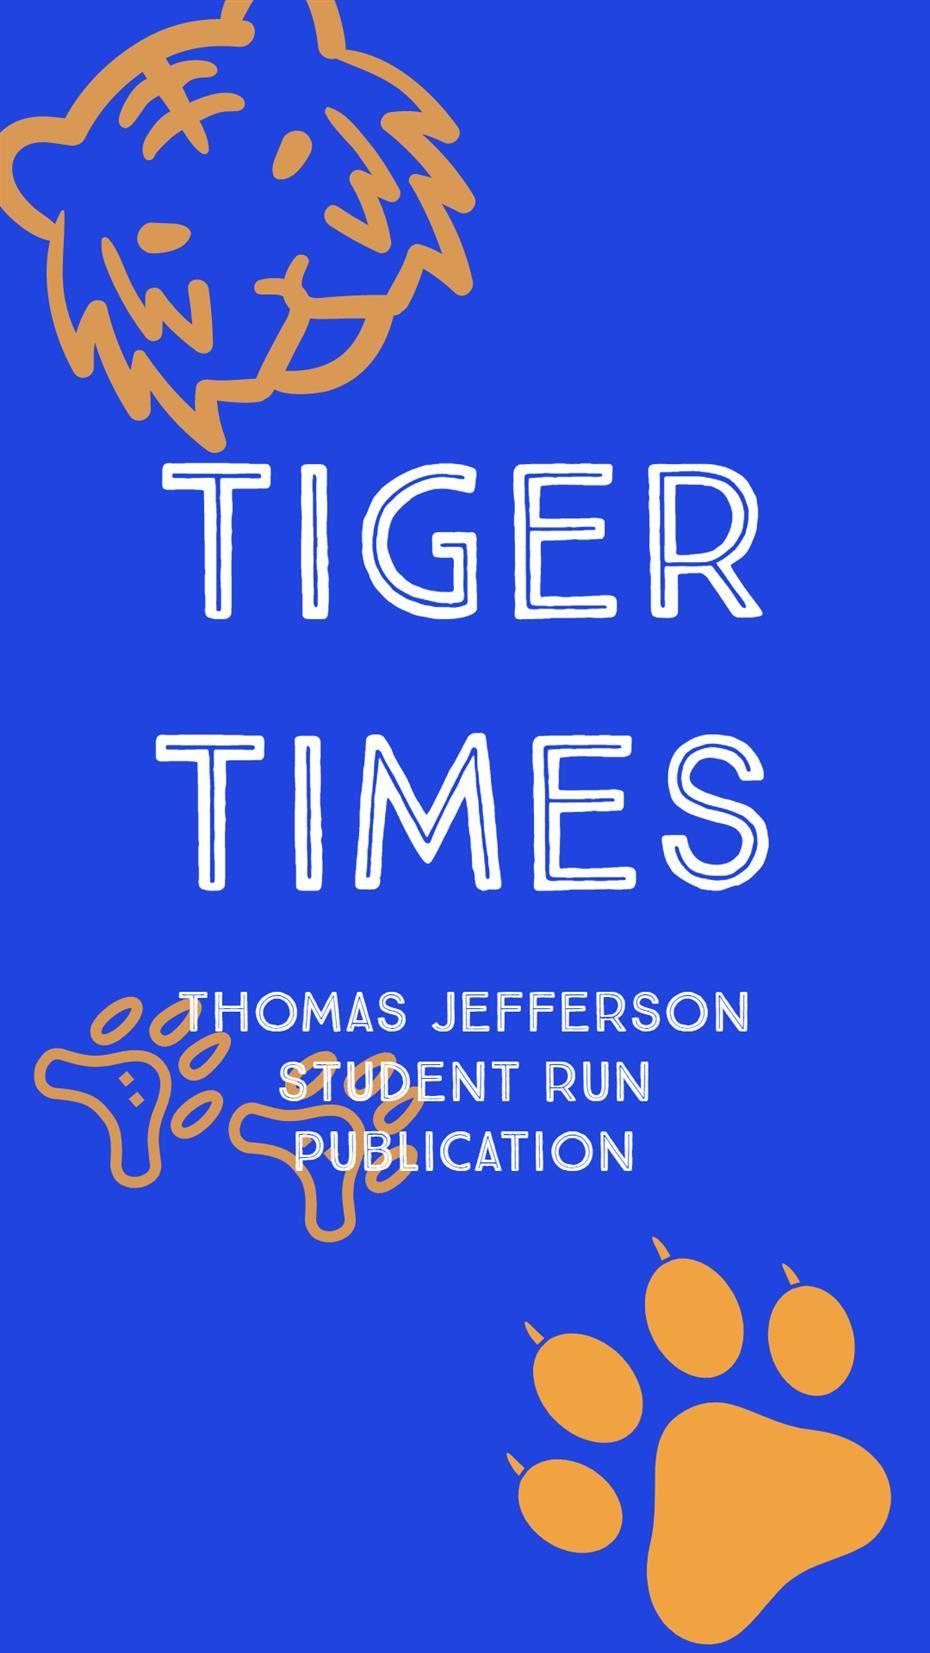 Thomas Jefferson Elementary School / Homepage